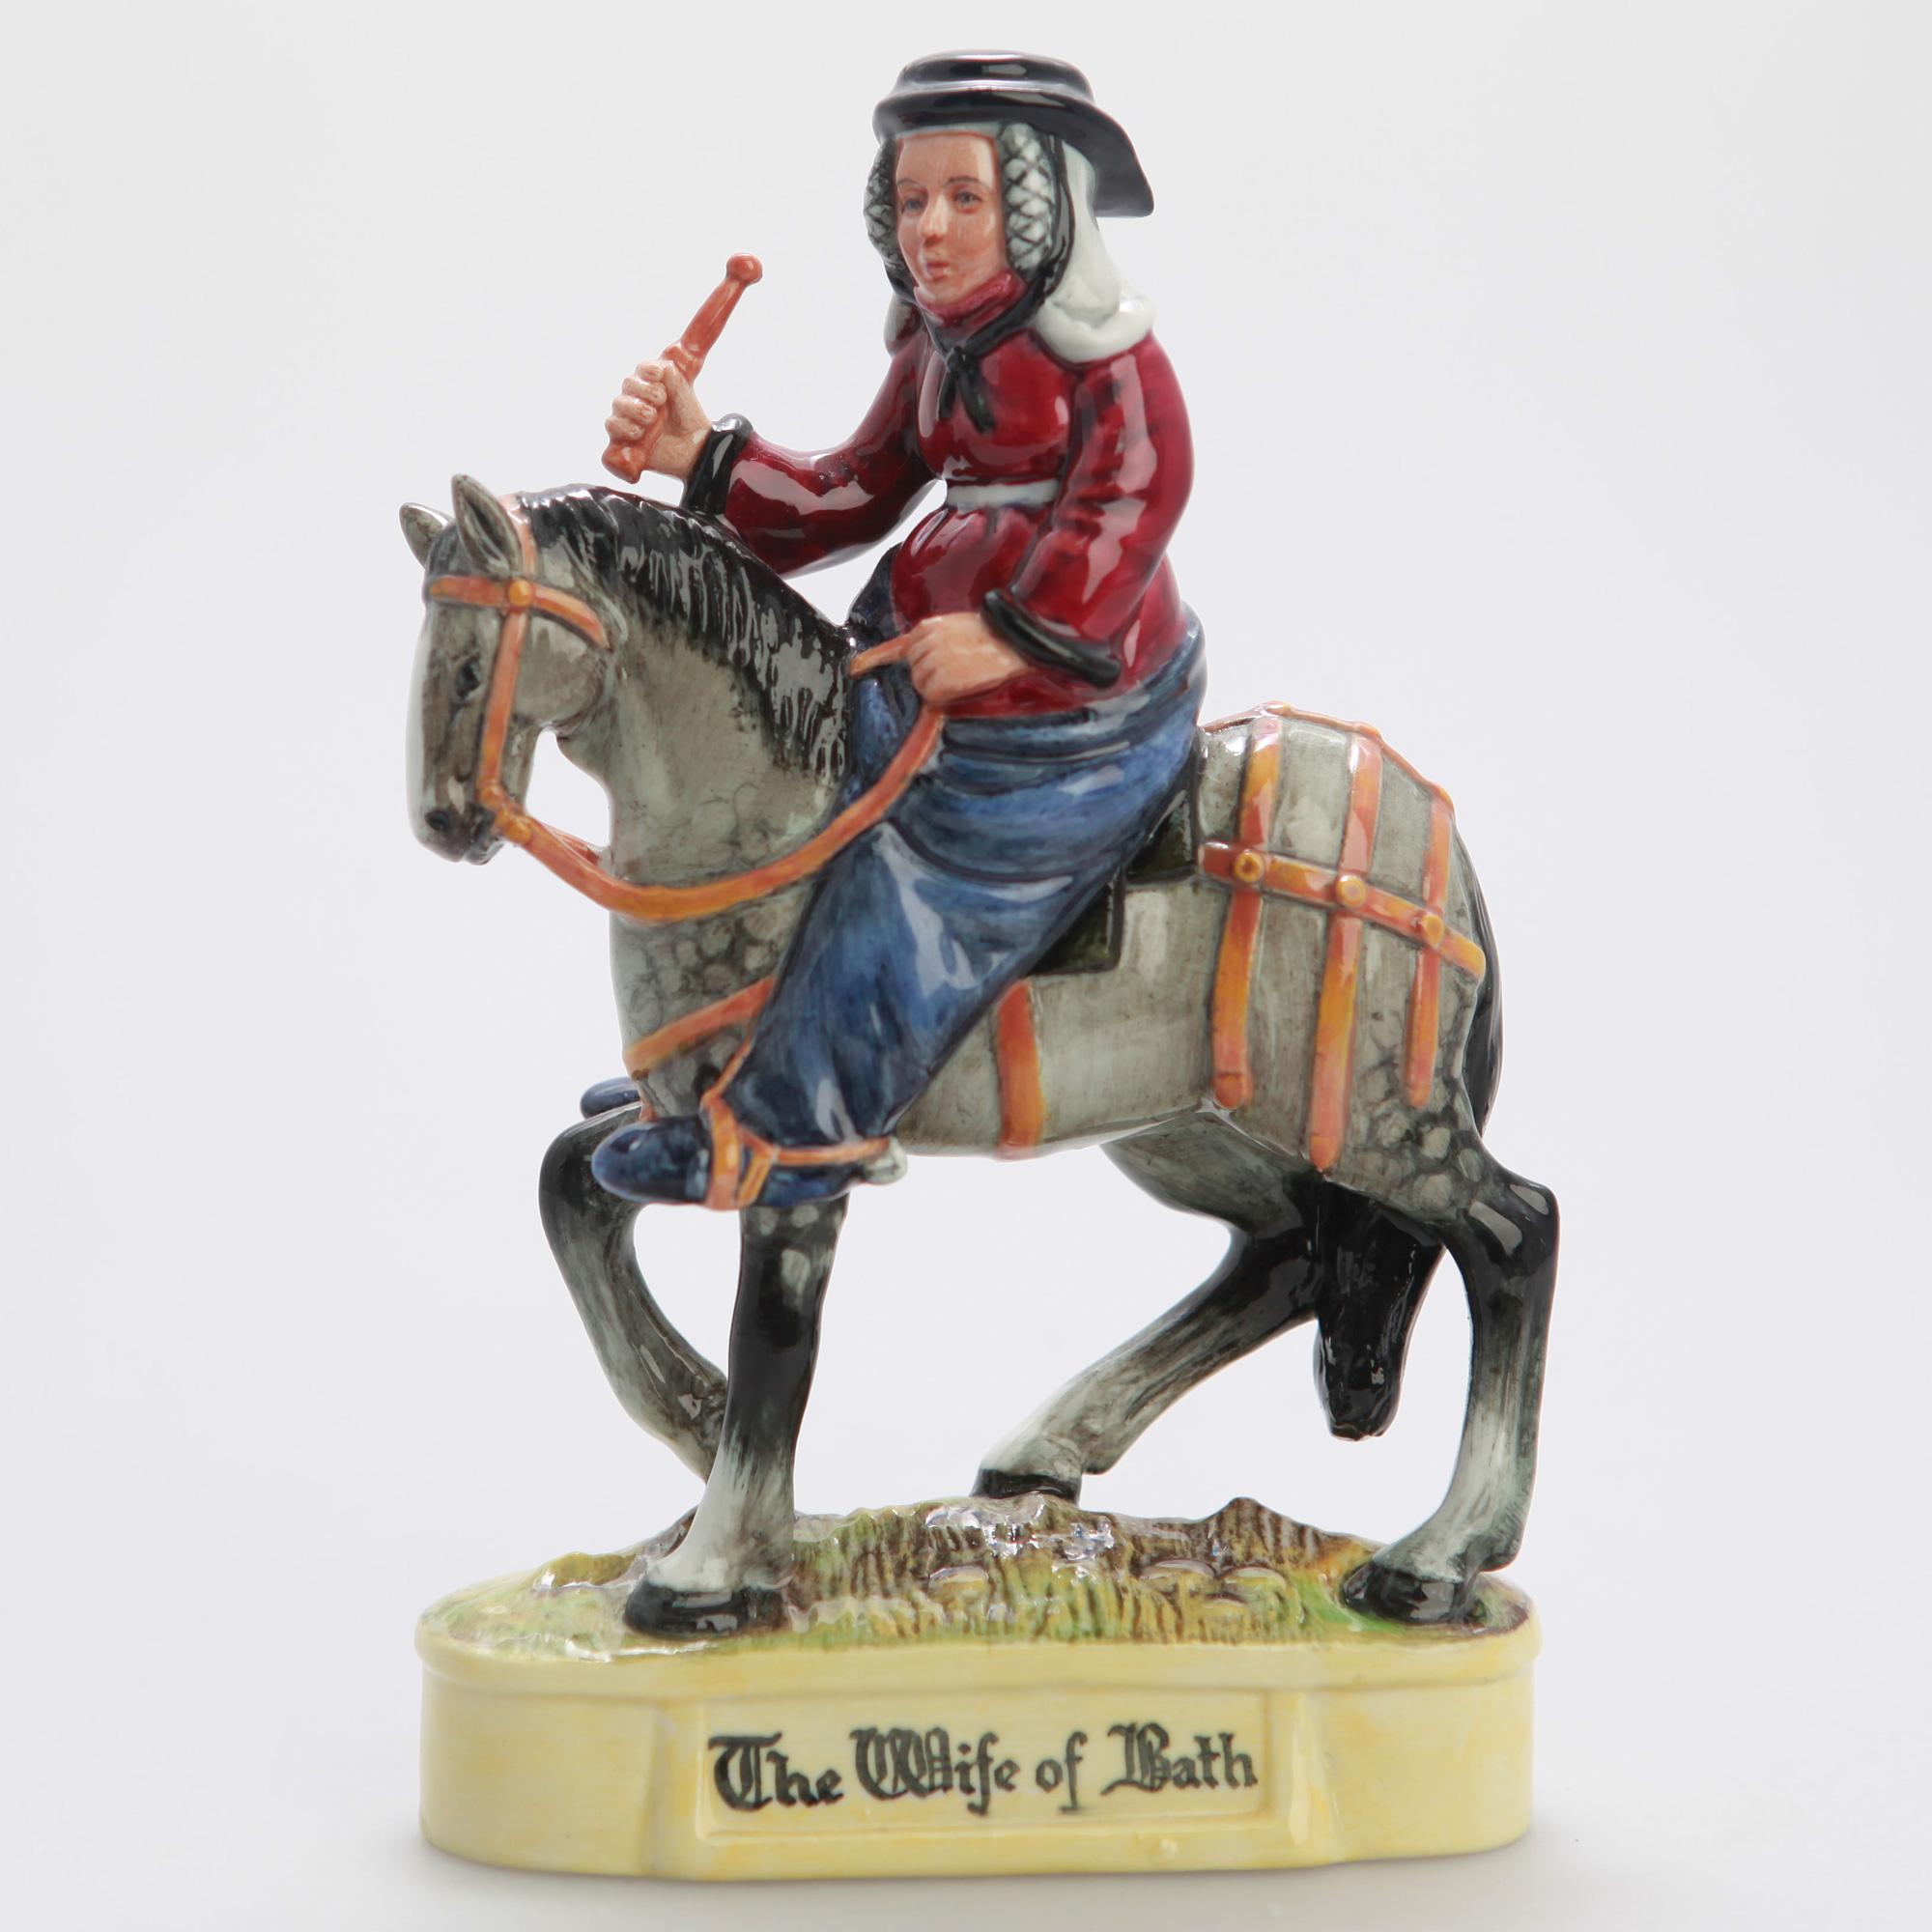 Wife of Bath Prototype - Royal Doulton Figurine